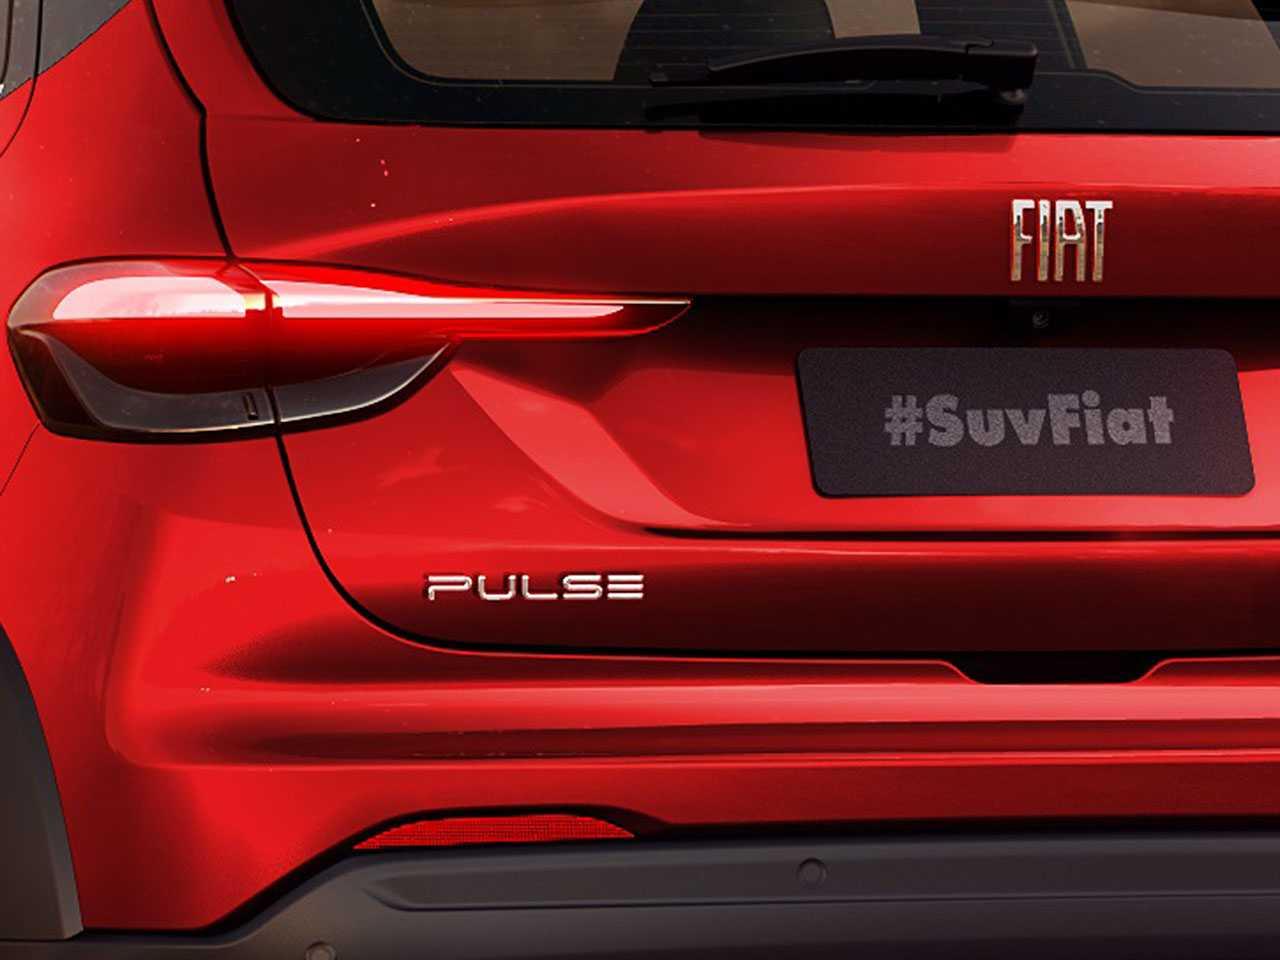 Fiat Pulse